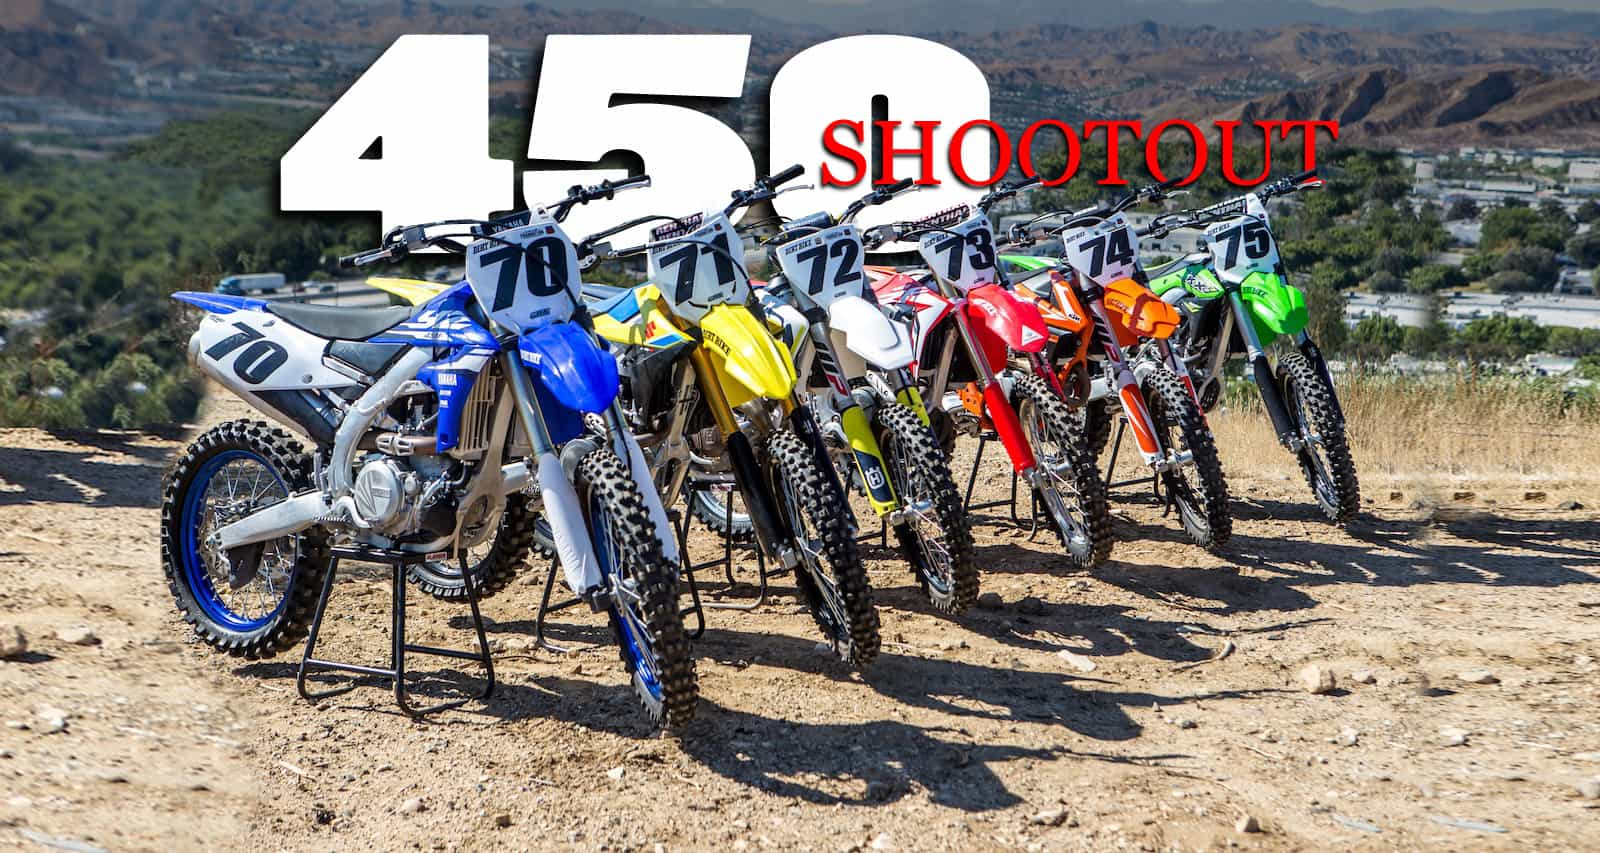 2018 450cc Mx Shootout Video Dirt Bike Magazine